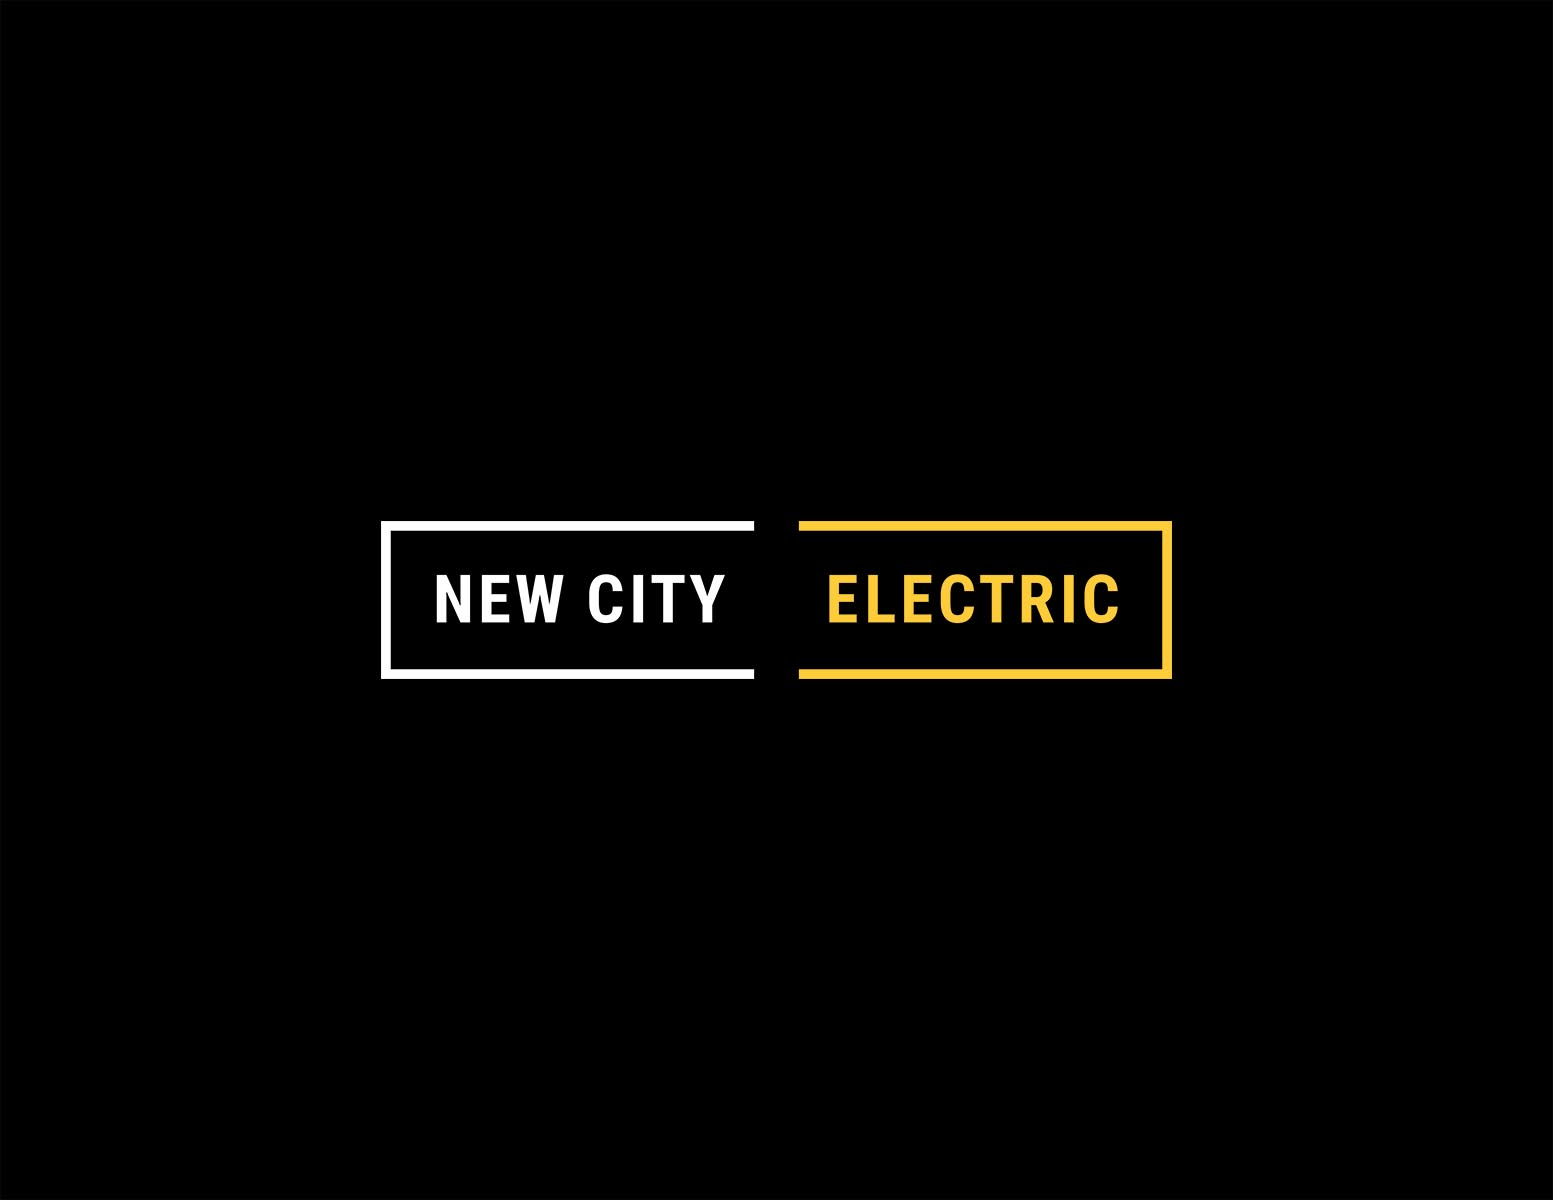 New_City_Electric_01.jpg